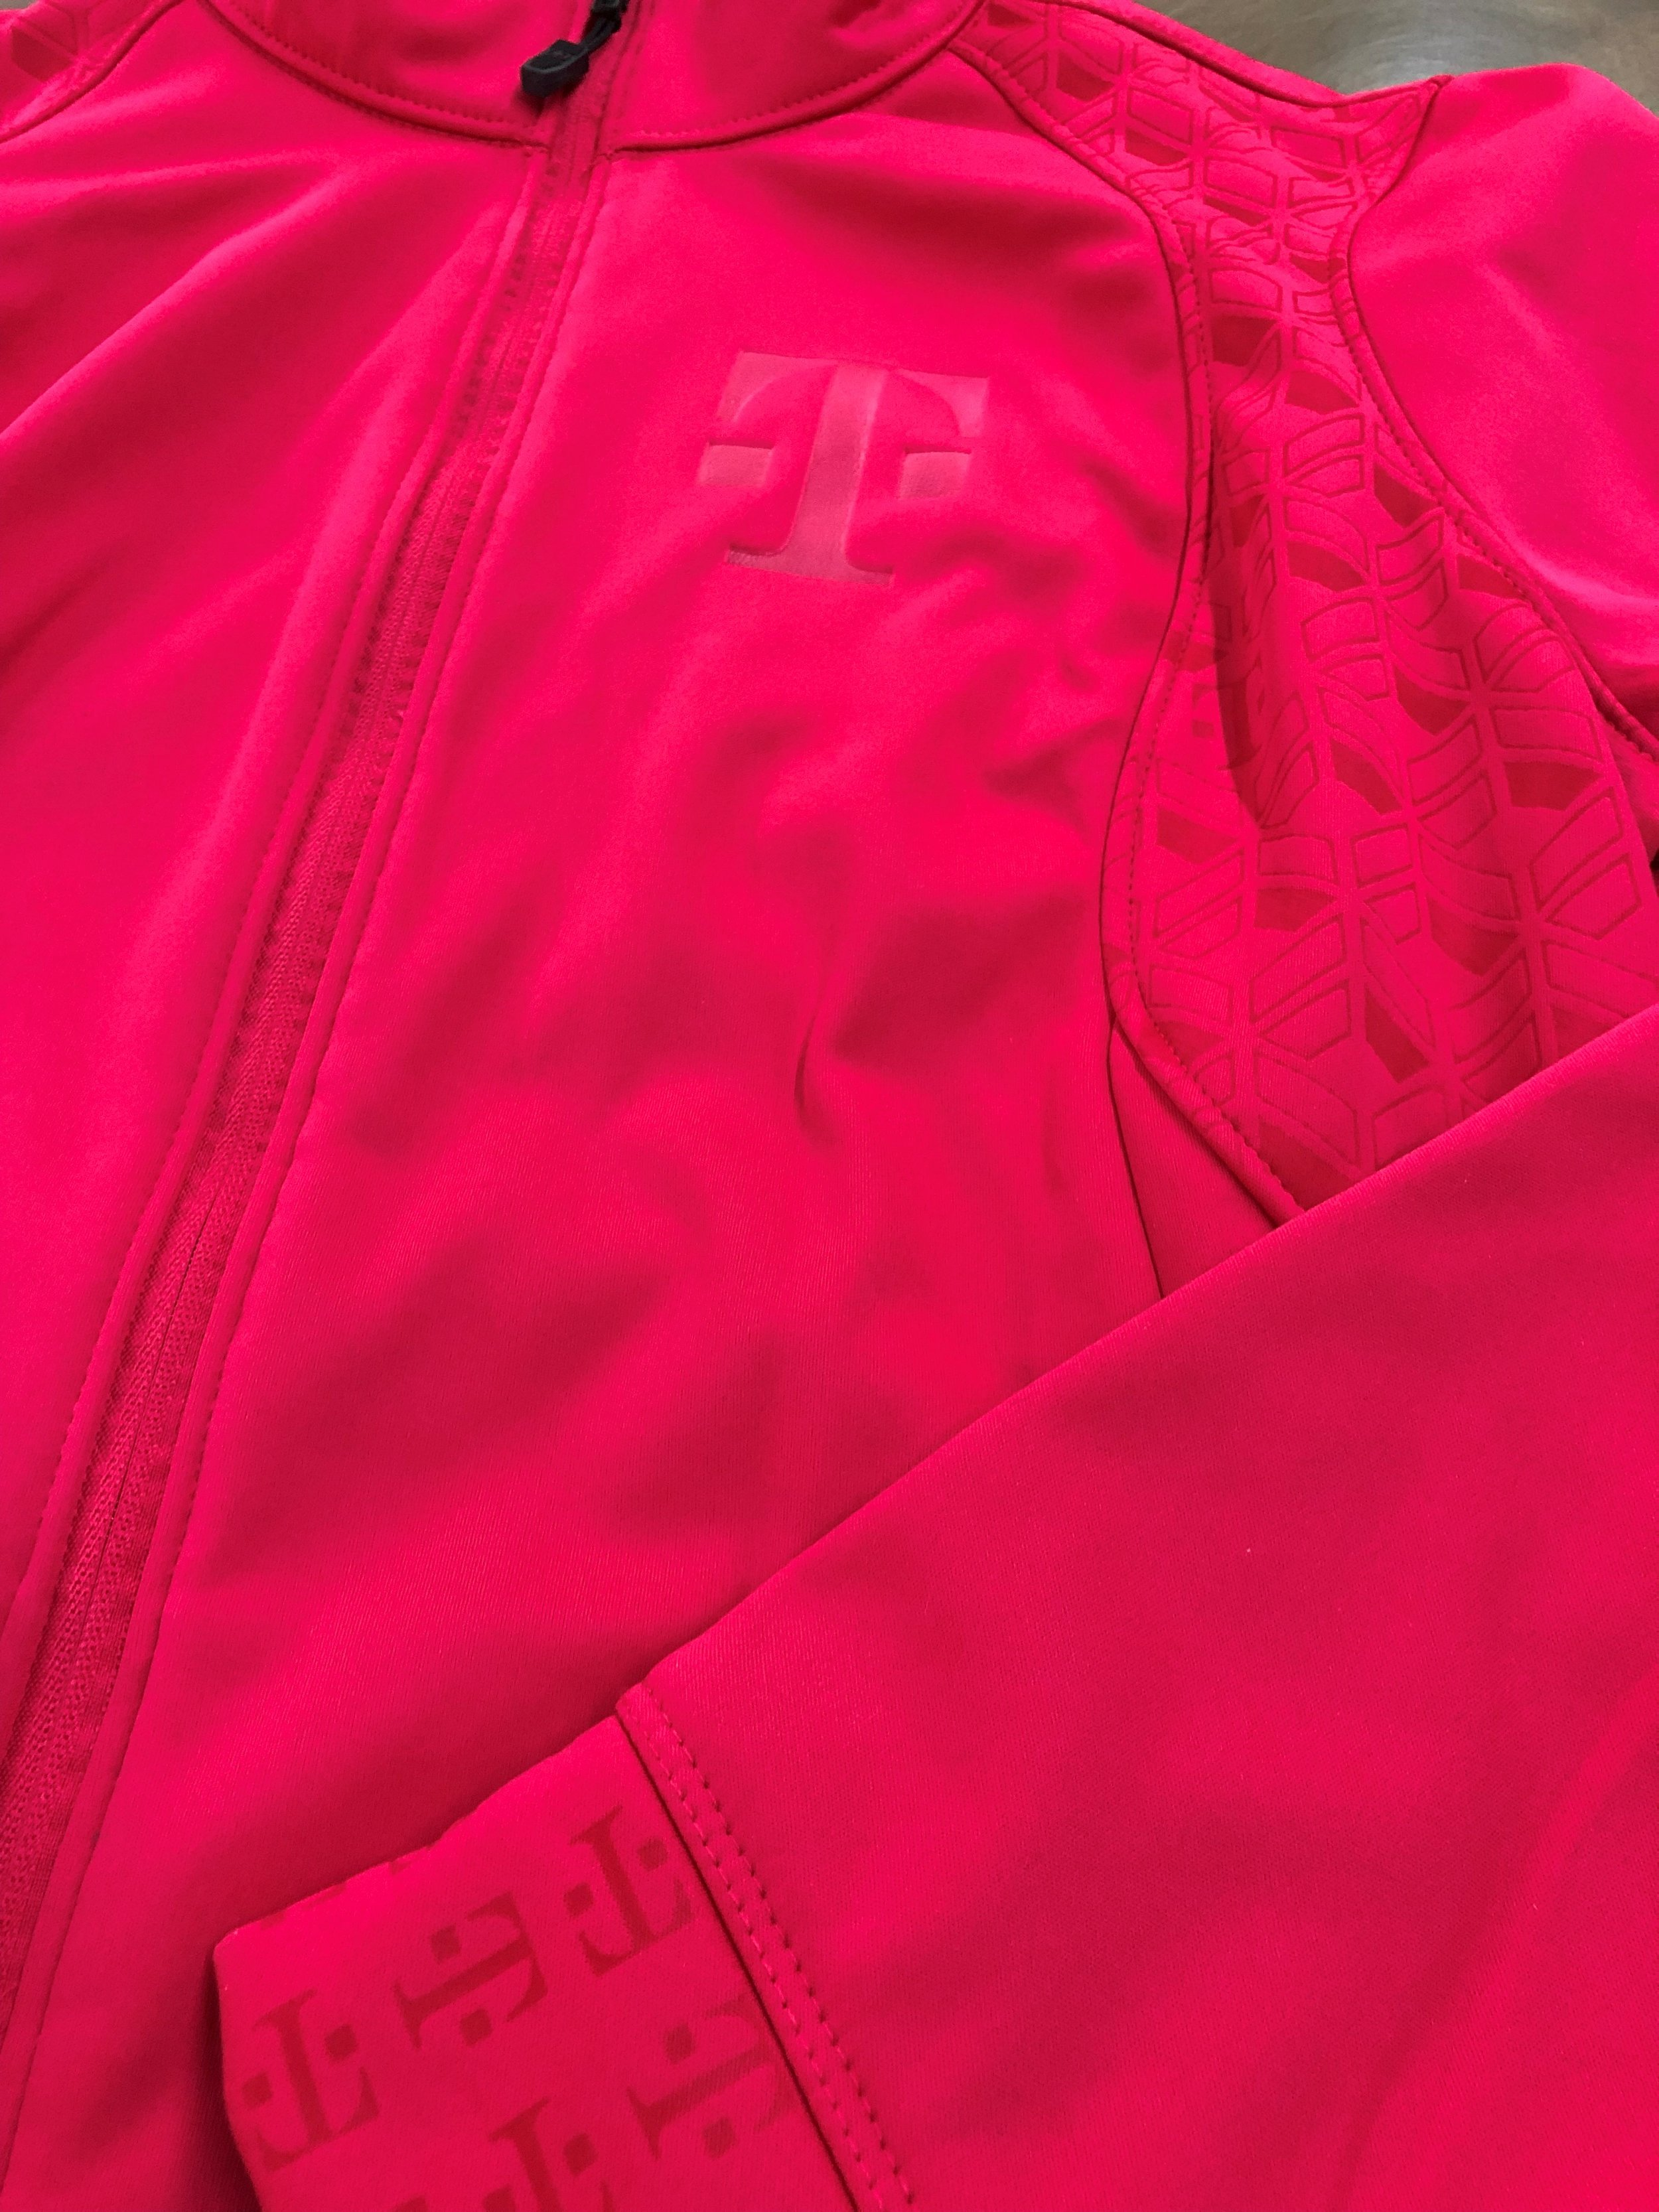 logounltd_laser_embroidery_screen_printing_apparel_uniform_custom_tshirts_kirkland_bellevue_seattle_redmond_branded_merchandise_promotional_products_logo_unltd_t_mobile_Tuesday_tmobile_un_carrier_magenta_5G_john_lege (31).jpg